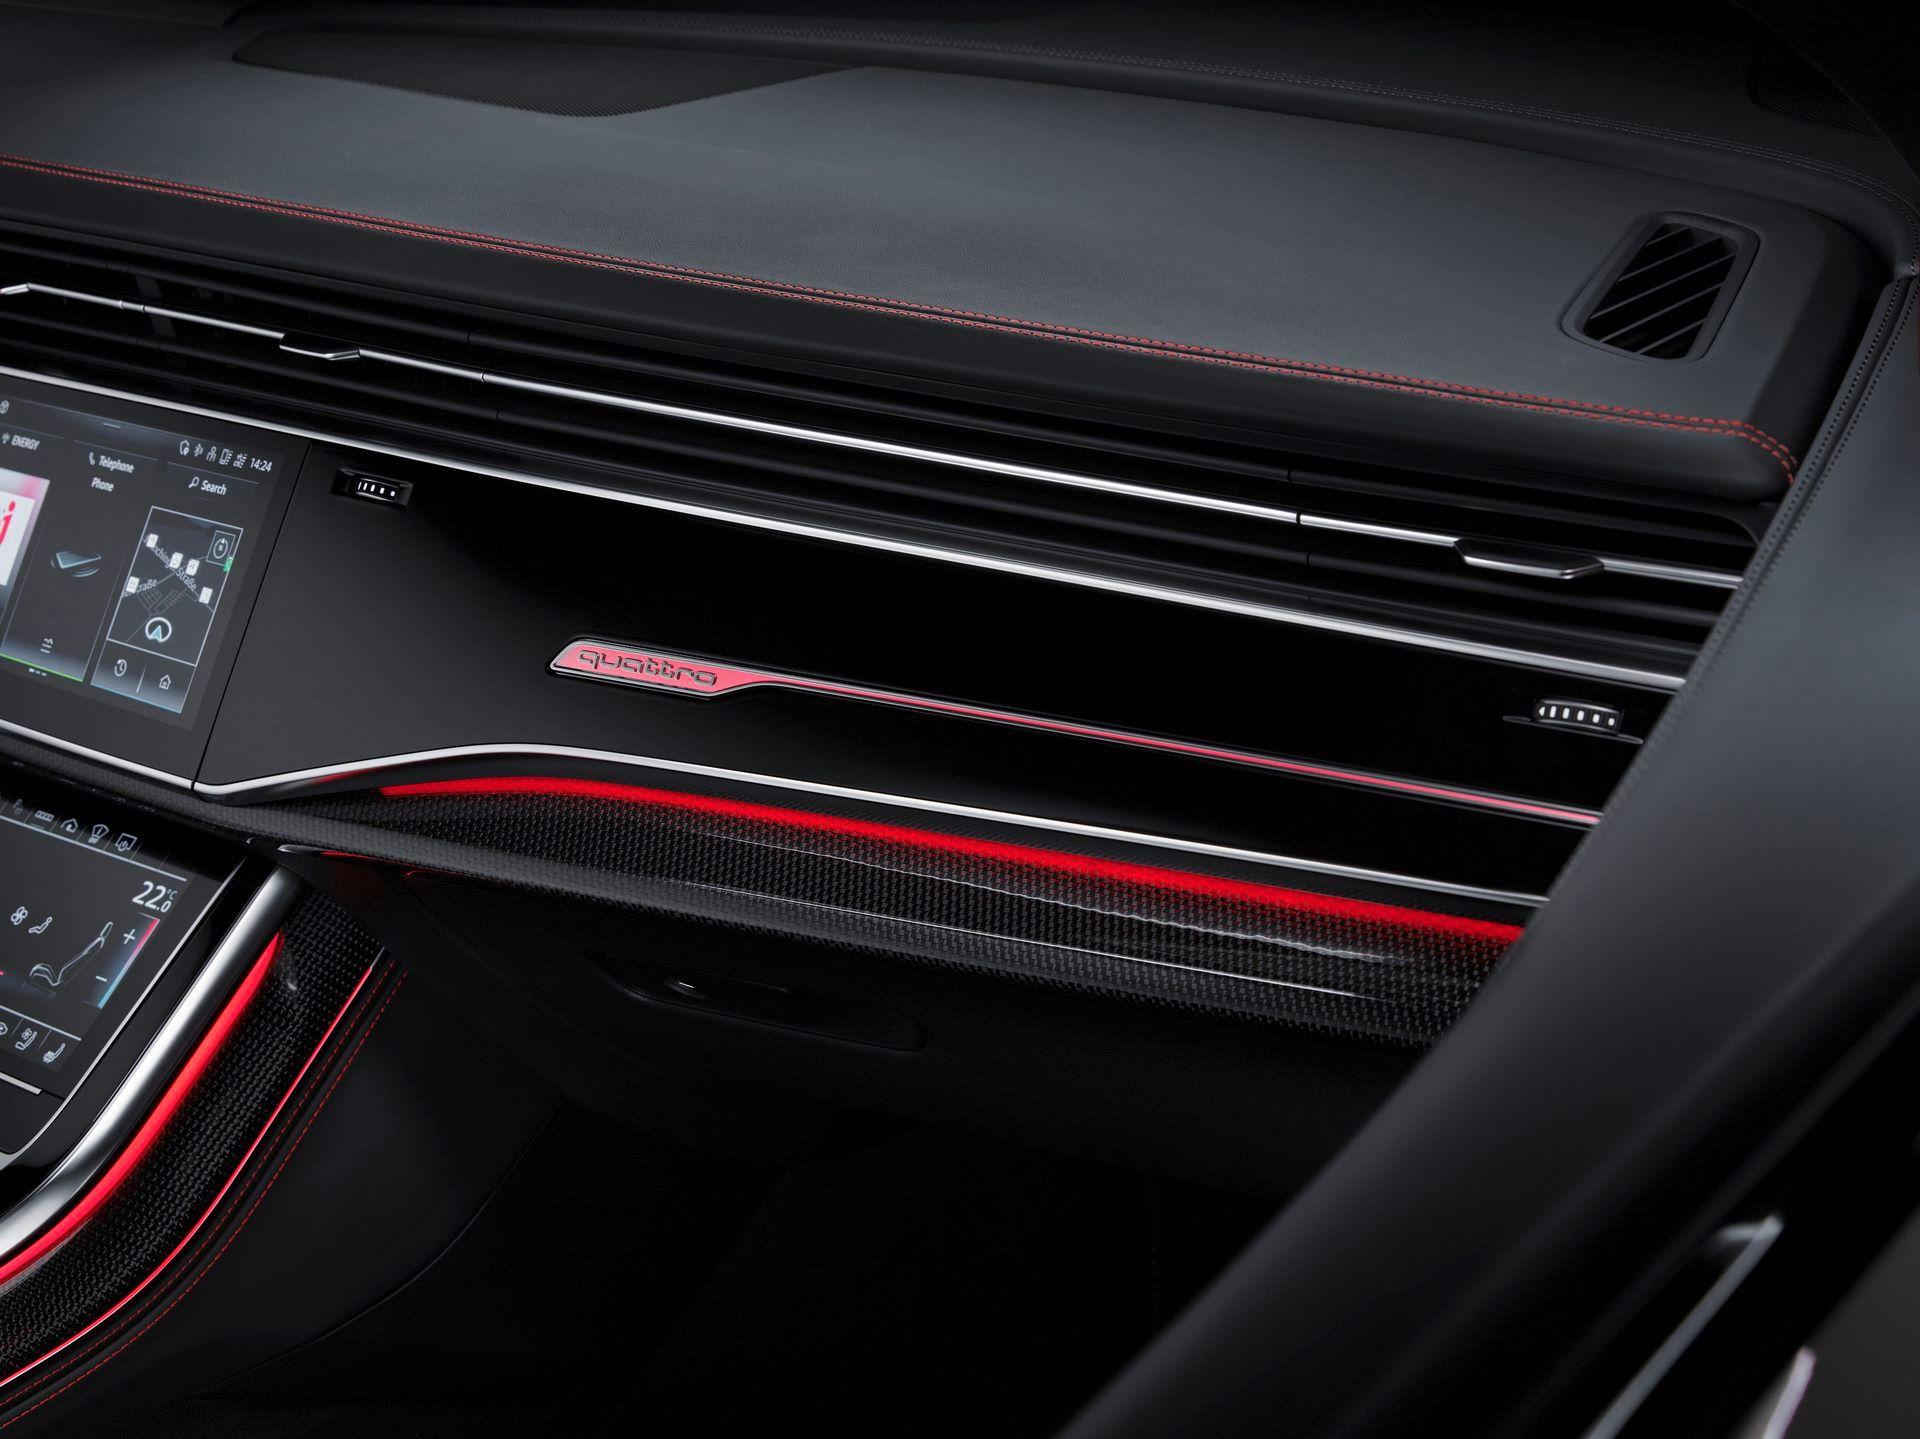 Audi-A4-A5-Q7-Q8-Competition-And-Competition-Plus-Trims-34